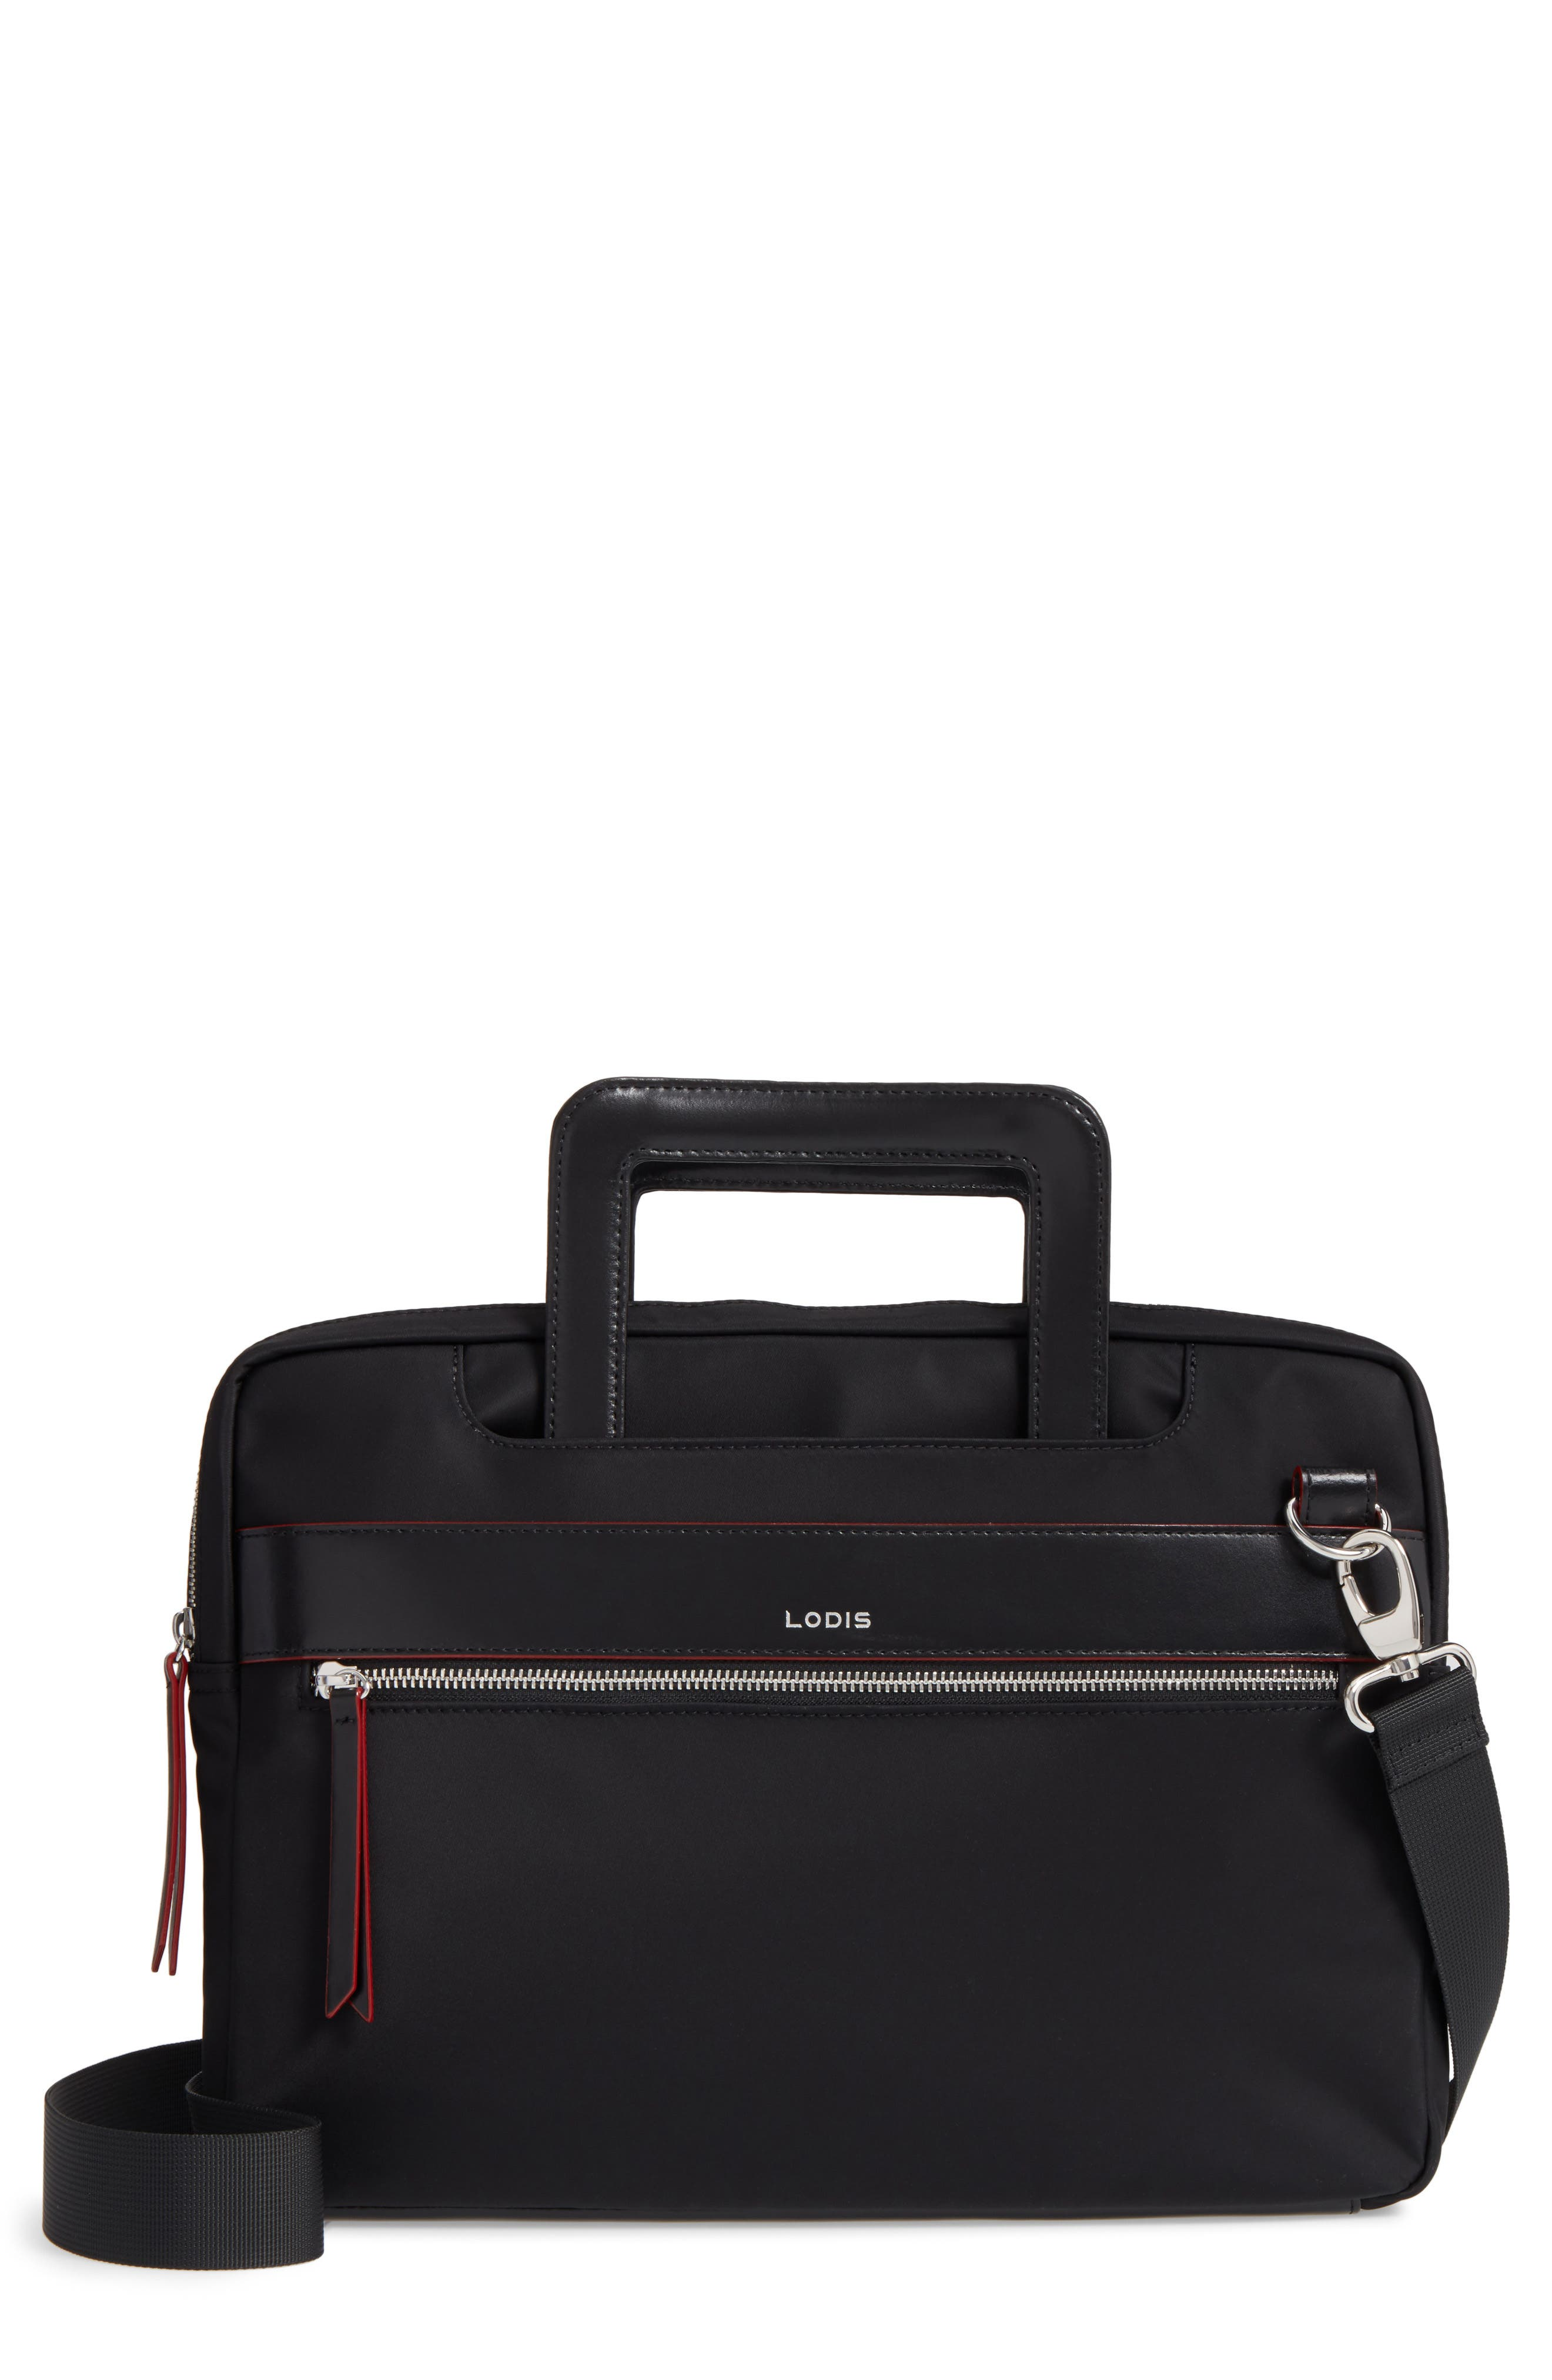 Alternate Image 1 Selected - Lodis Kate Under Lock & Key Cora Laptop Crossbody Bag